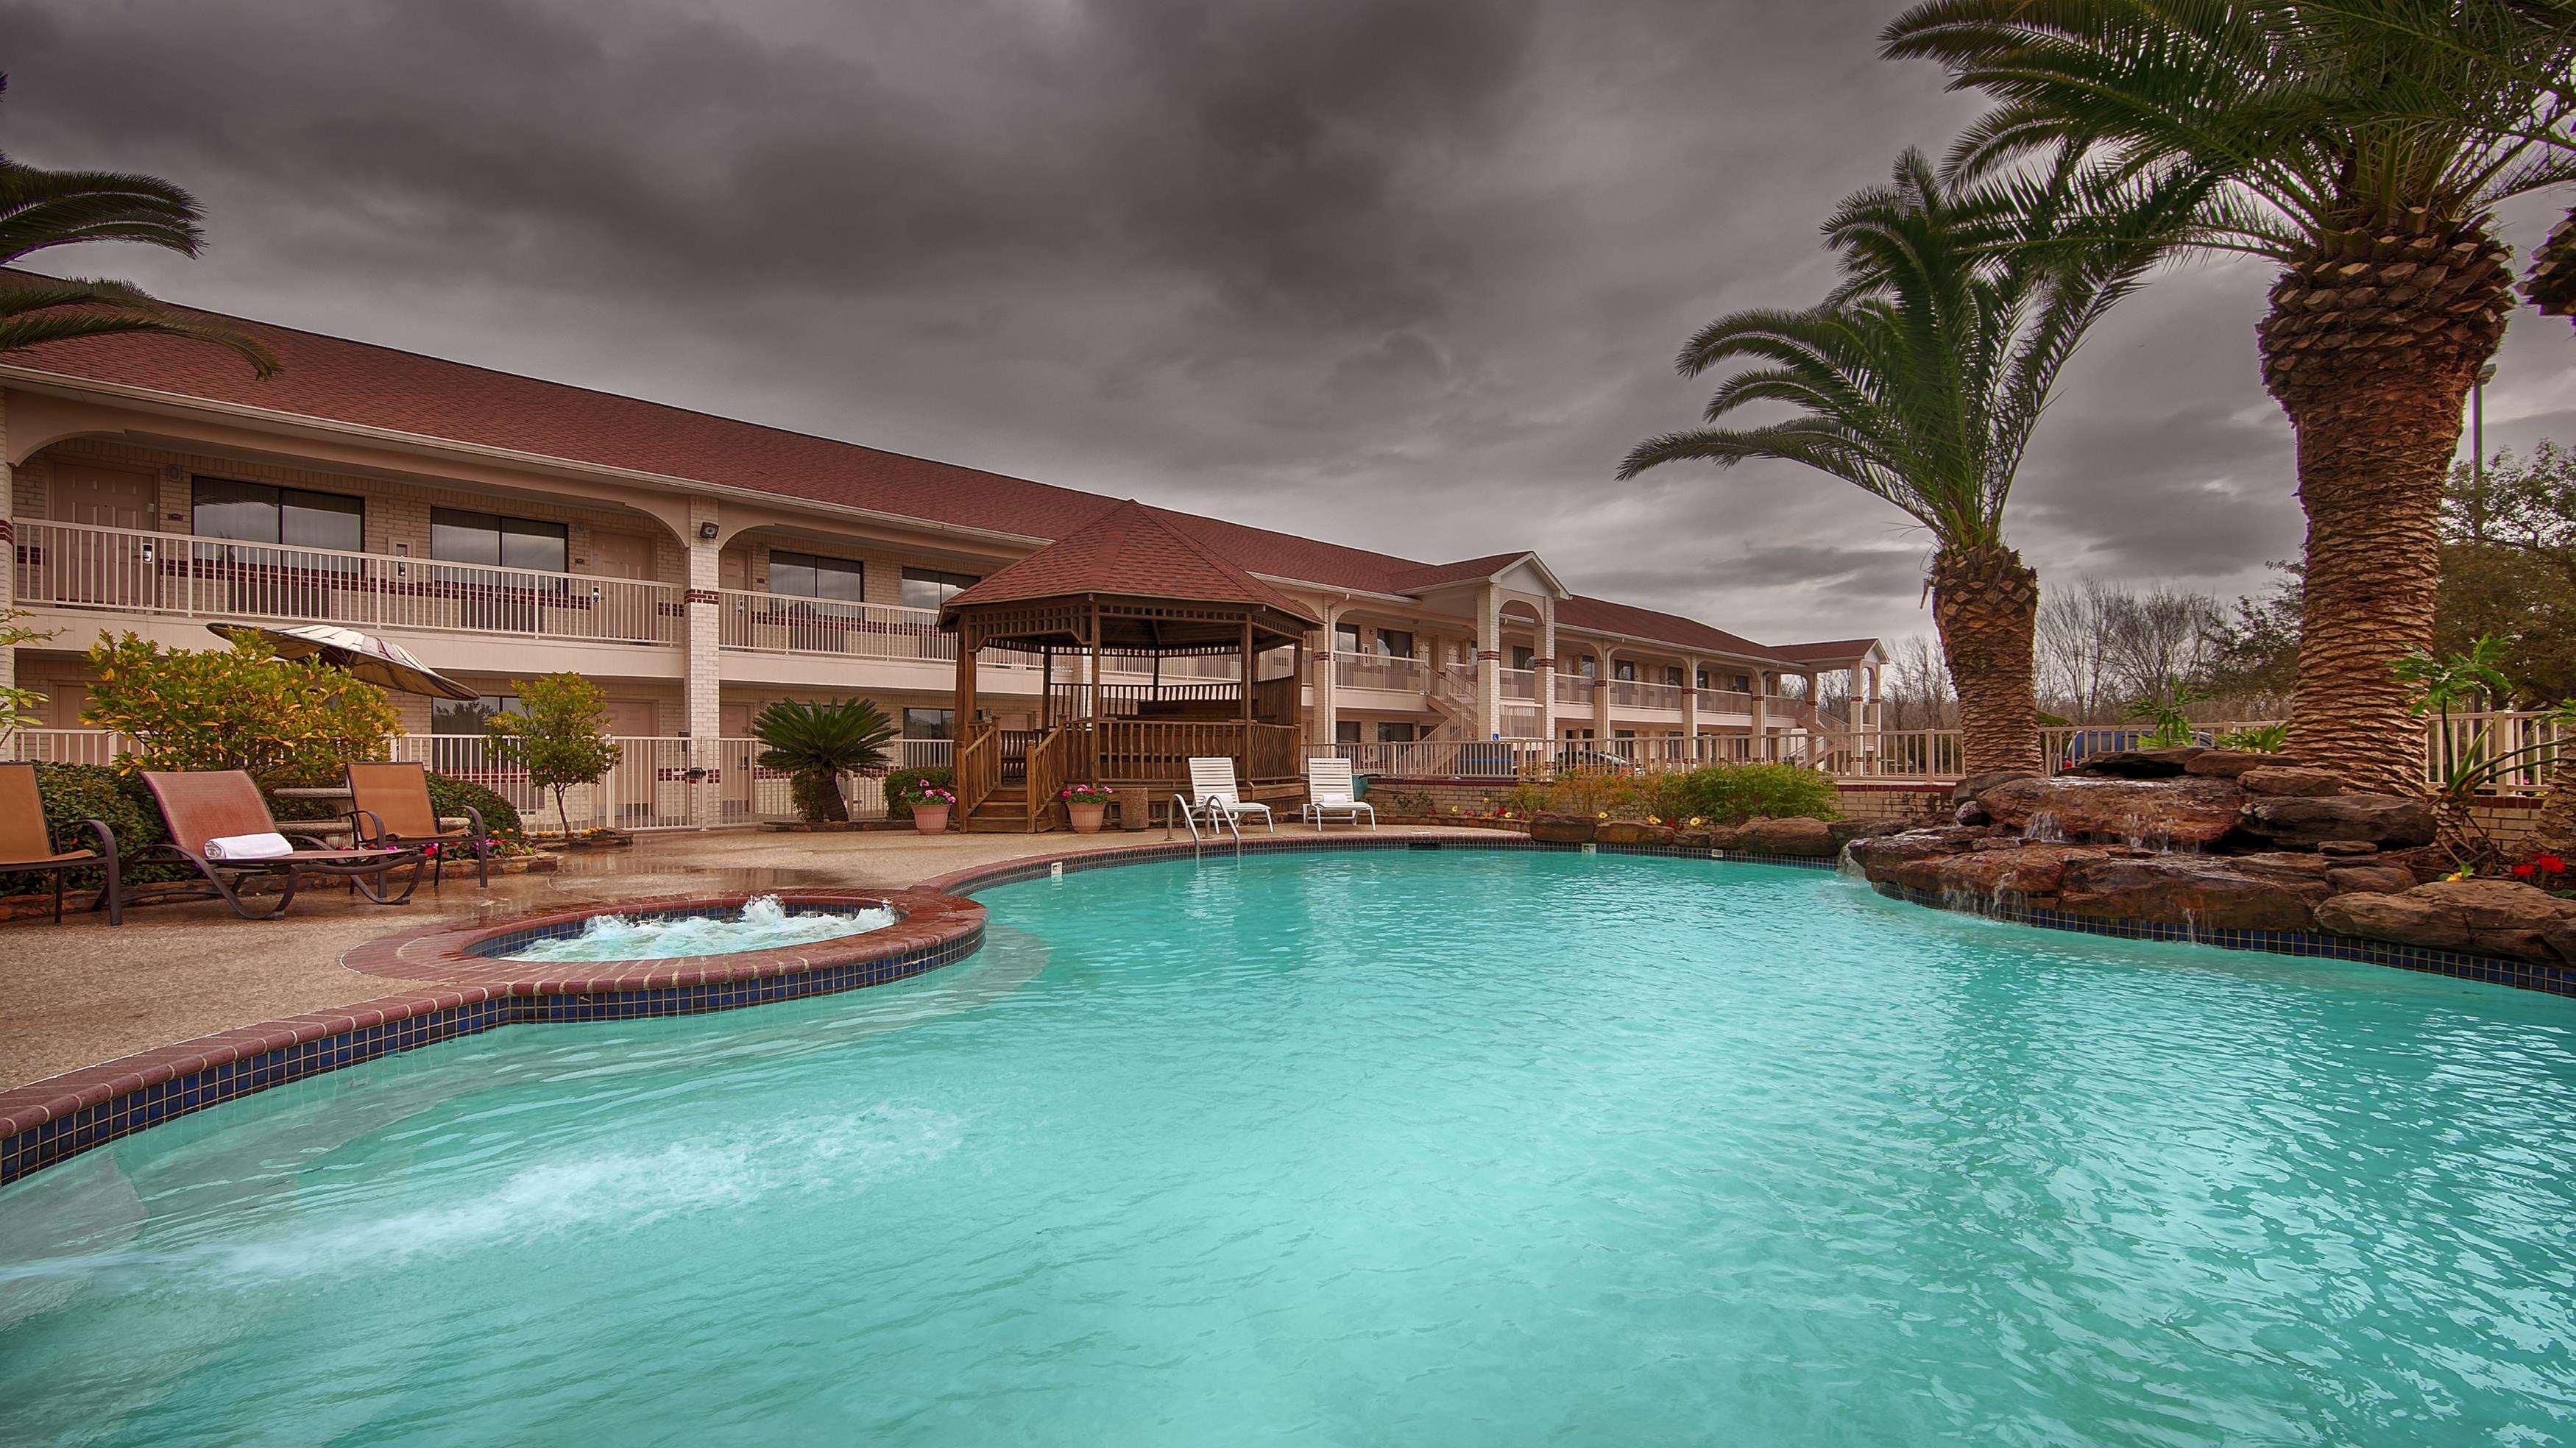 Best Western Pearland Inn image 15